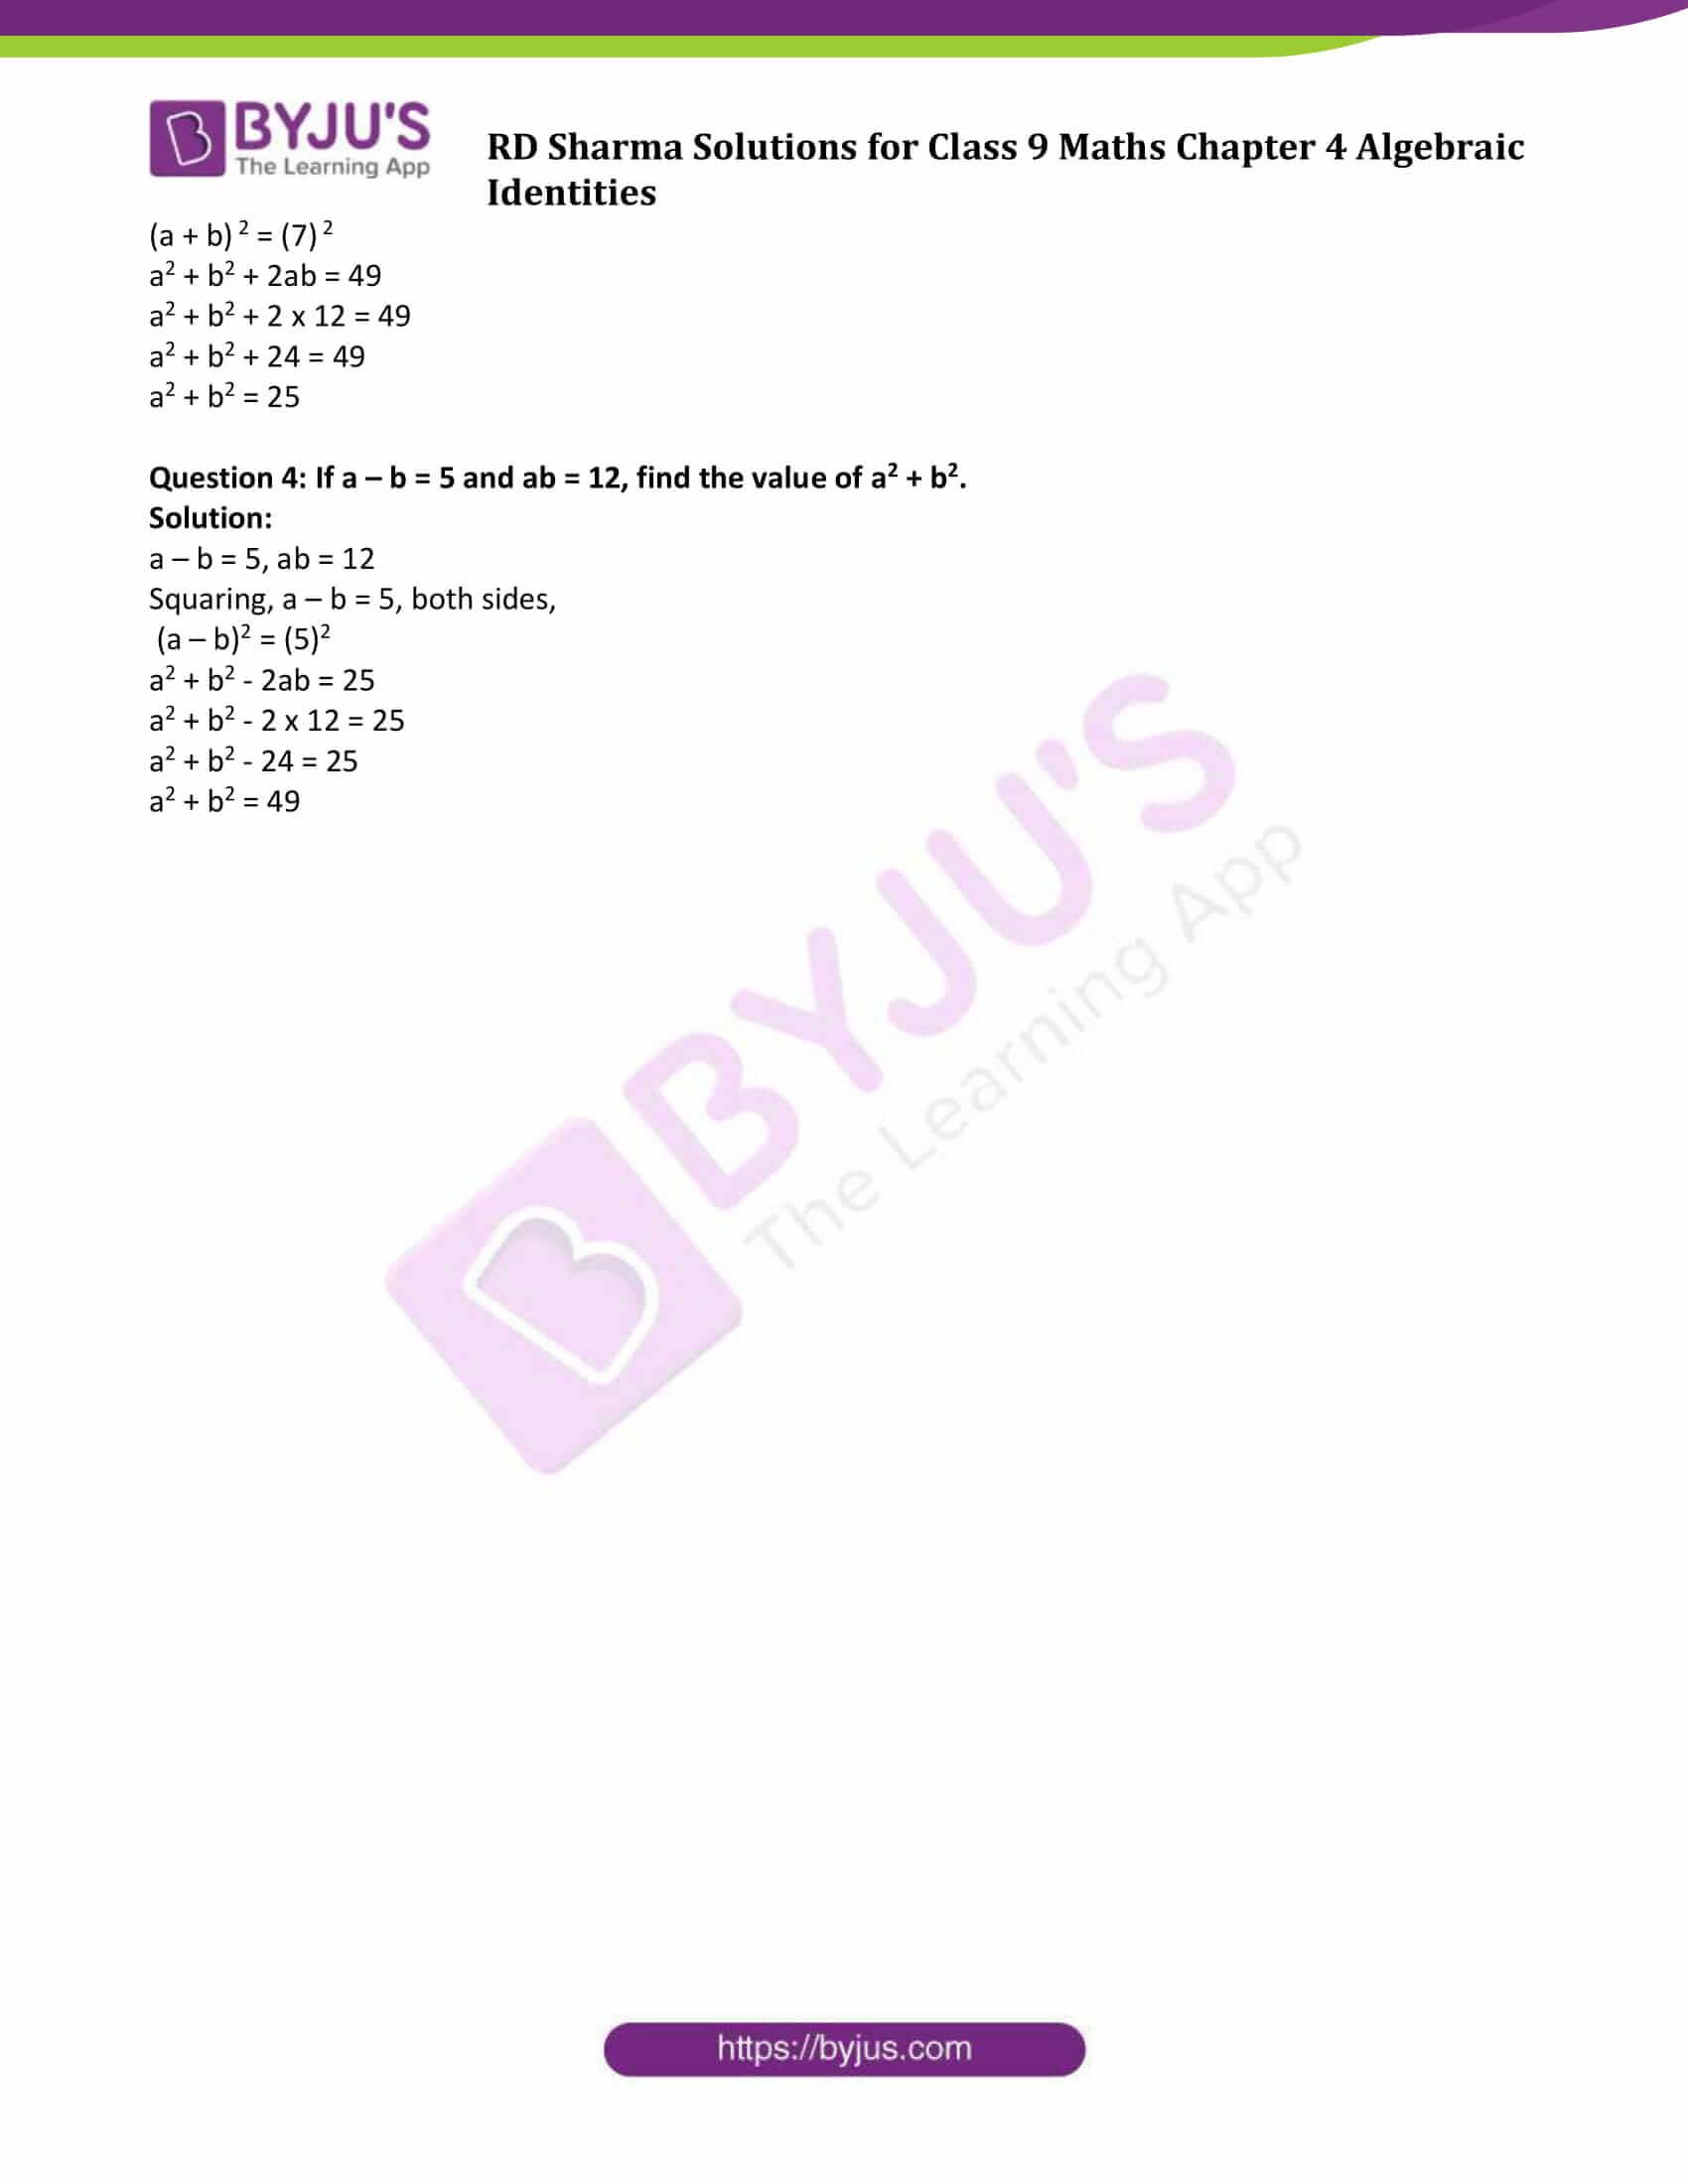 RD Sharma Solution class 9 Maths Chapter 4 Algebraic Identities 28